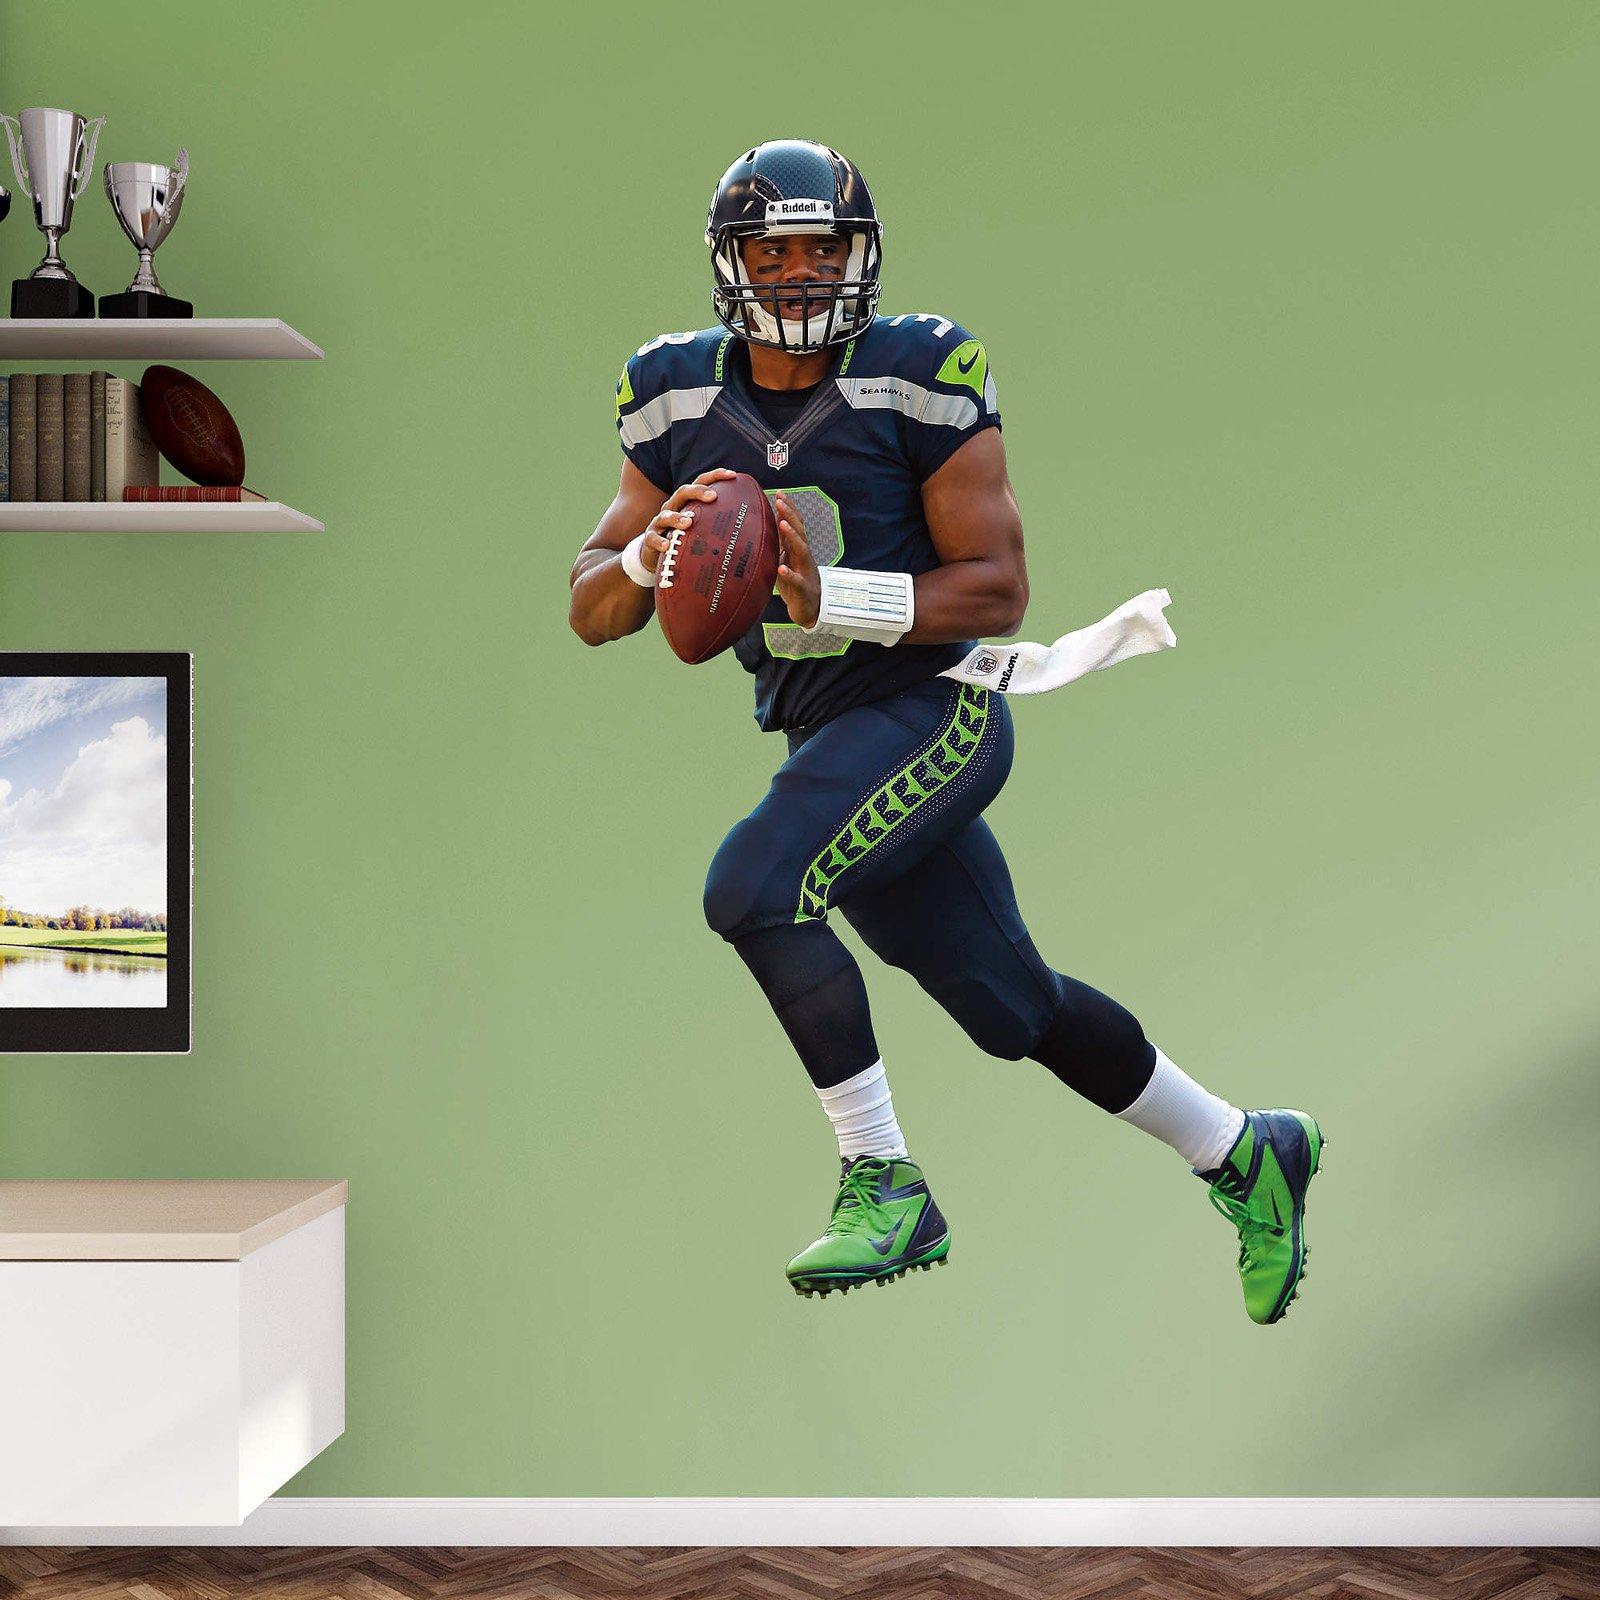 Fathead NFL Seattle Seahawks Russell Wilson Wall Decal